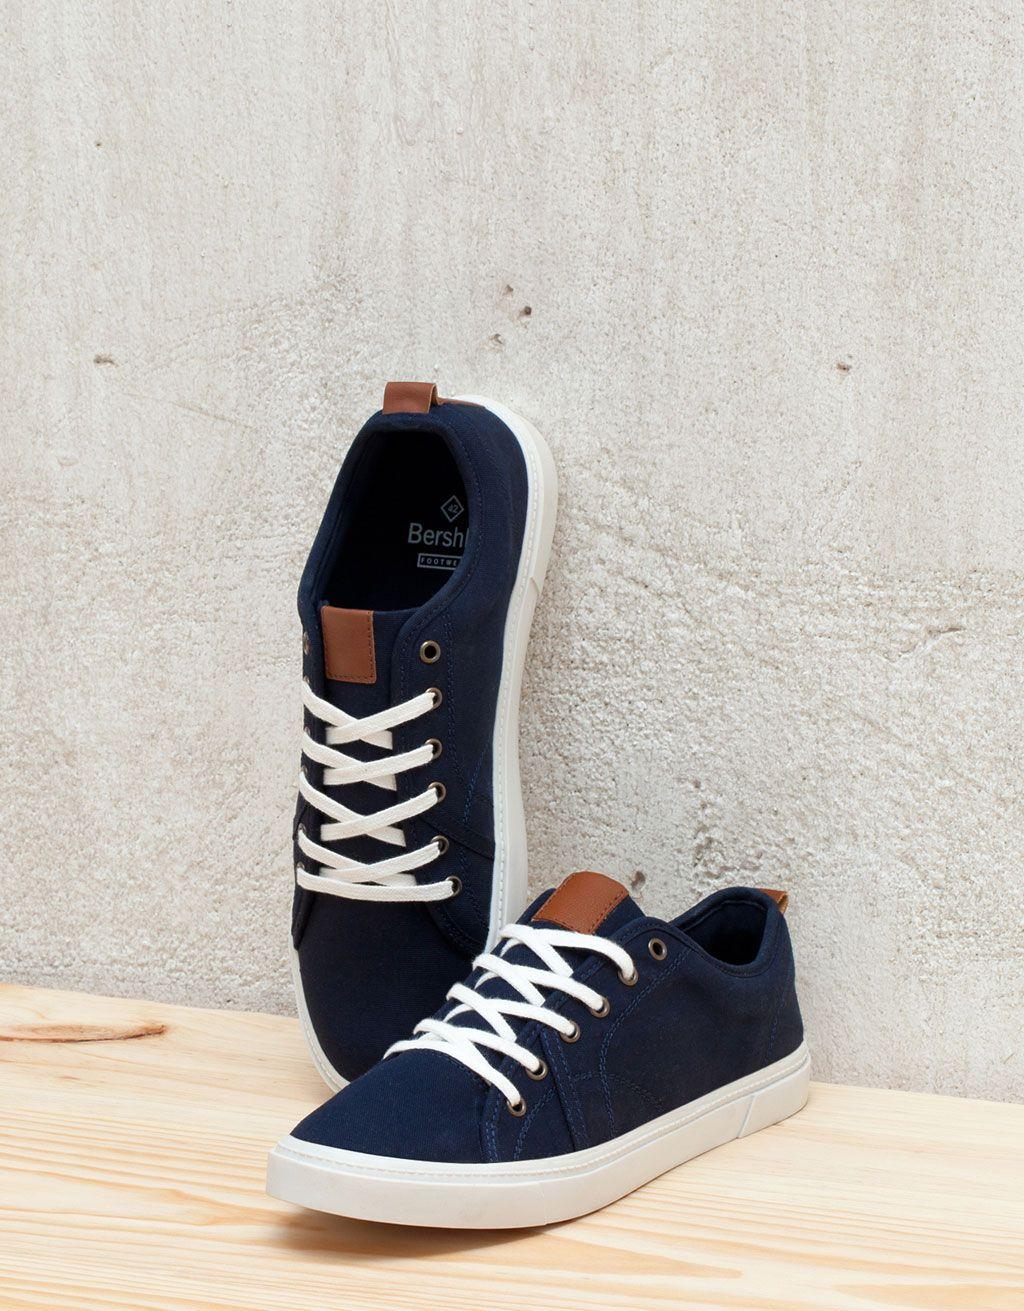 cheaper 9073d e4356 Men s fabric sneakers - View All - Bershka Romania Trendy Mens Shoes, New  Shoes,